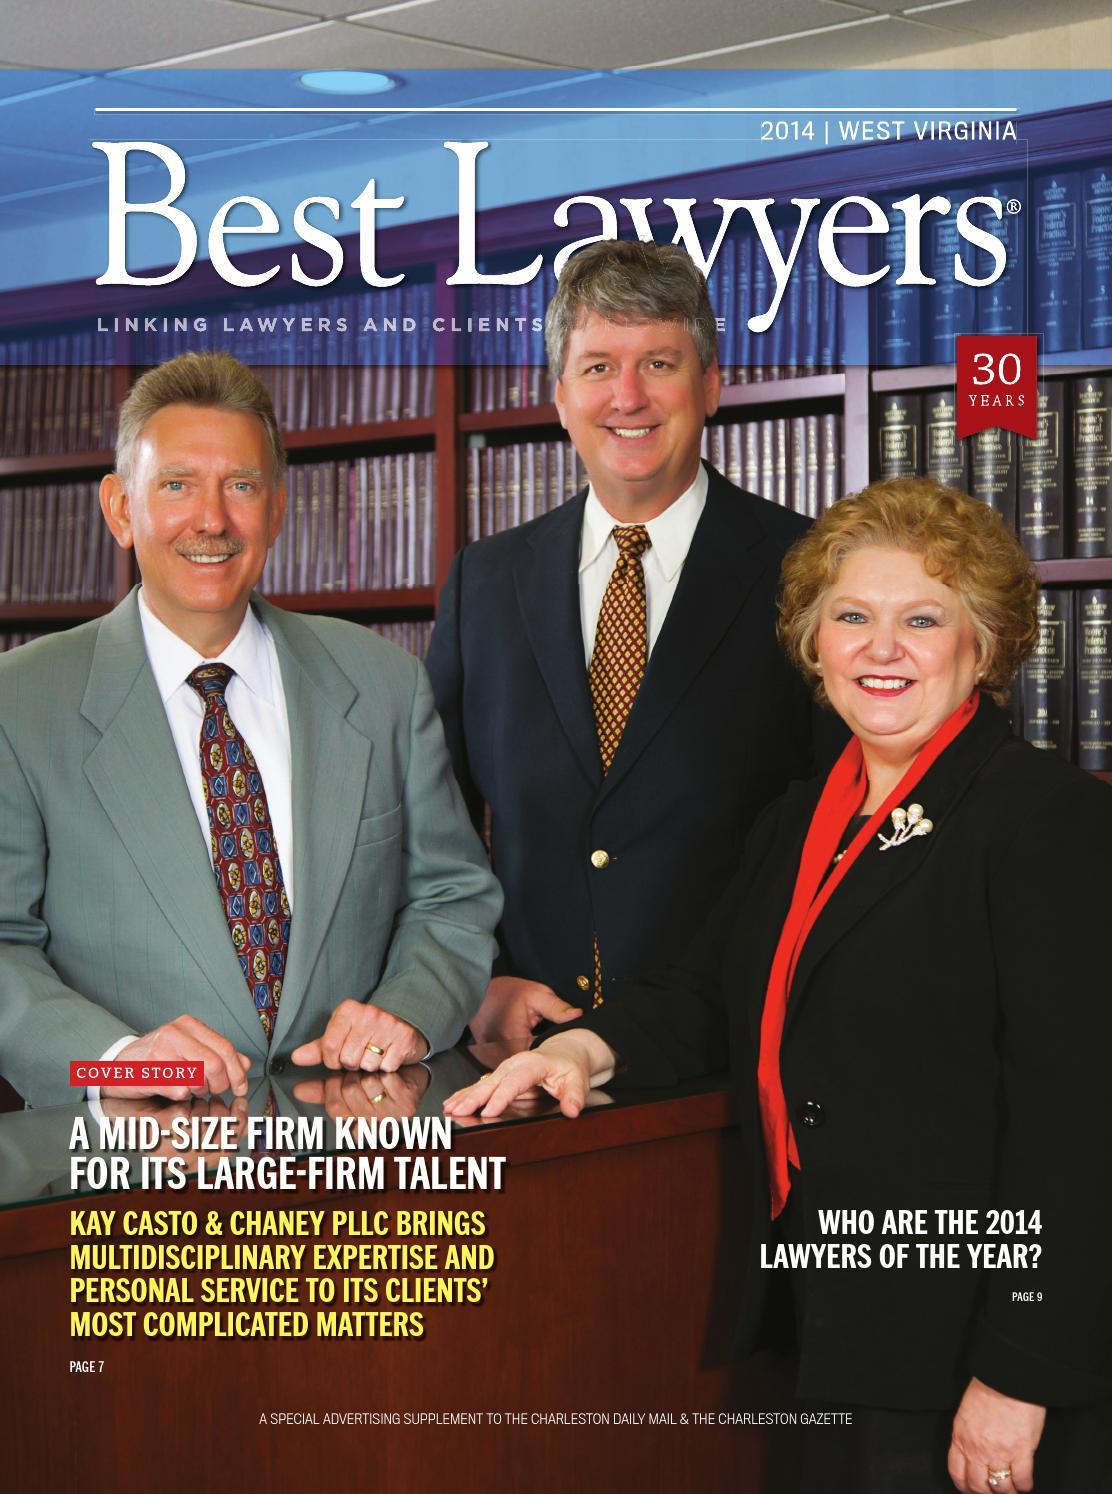 Best Lawyers In West Virginia 2014 By Best Lawyers Issuu